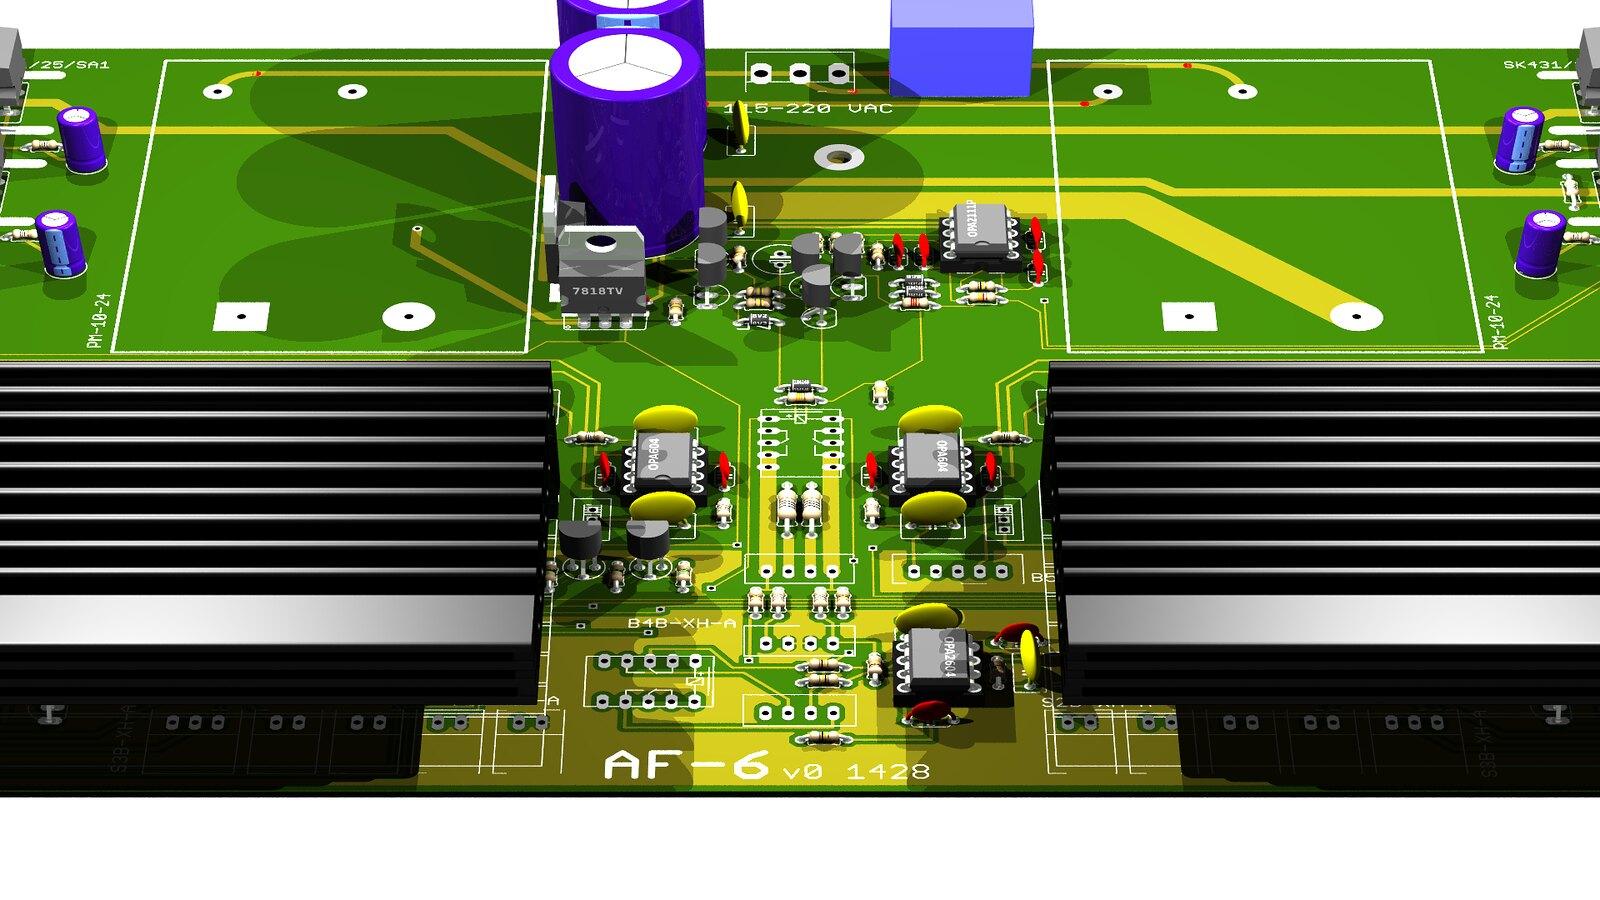 AF-6: Il circuito stampato - Pagina 3 14444029087_419ab9d5b5_h_d